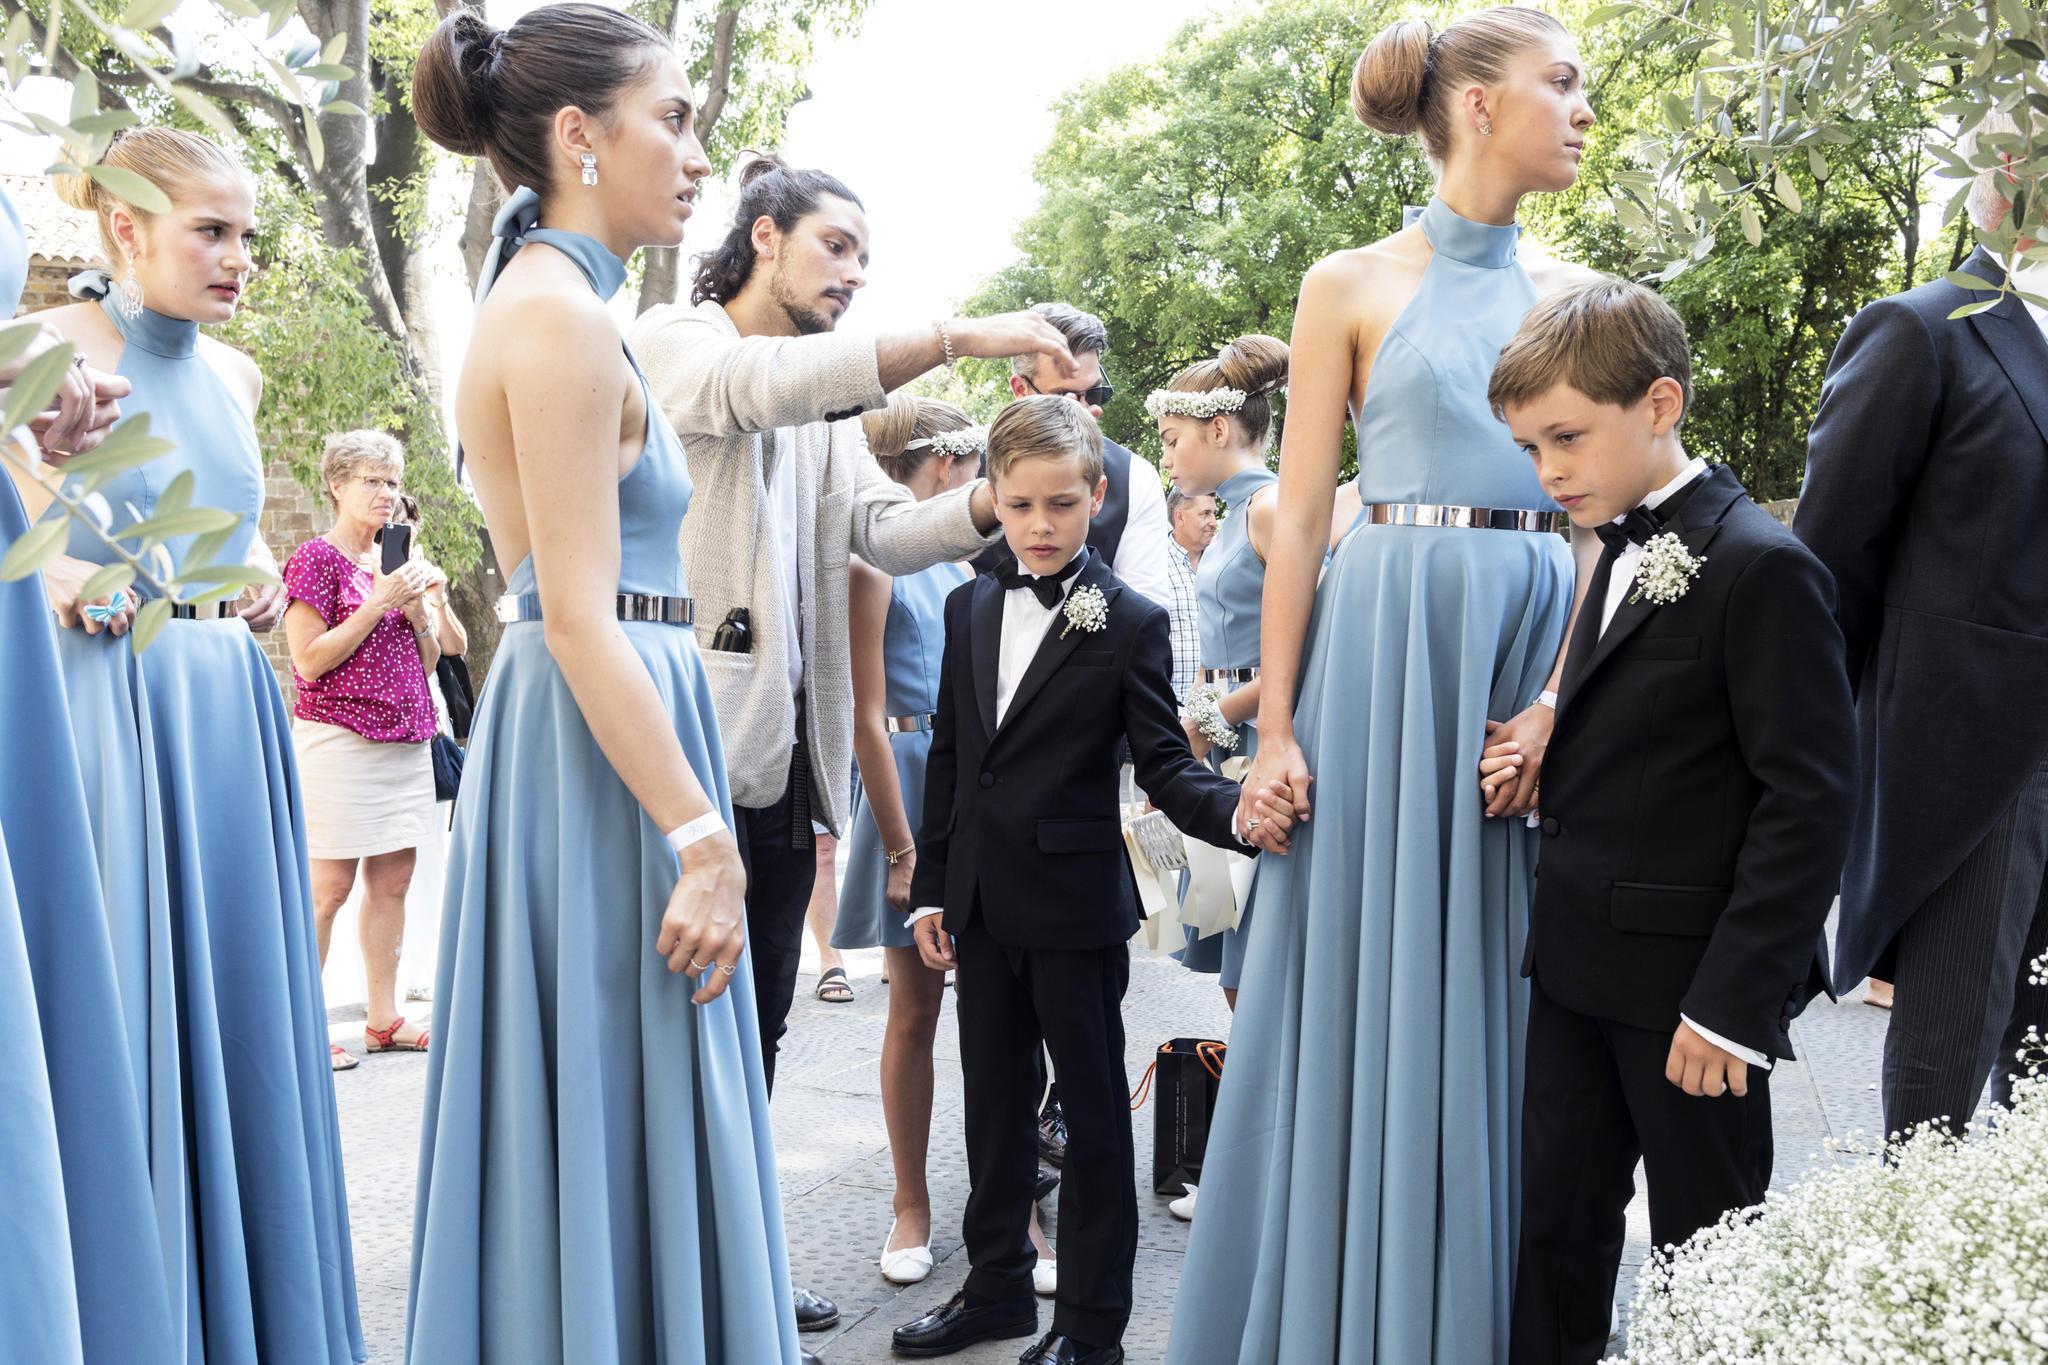 Victoria Swarovski Hochzeitskleid Preis - Abendkleid